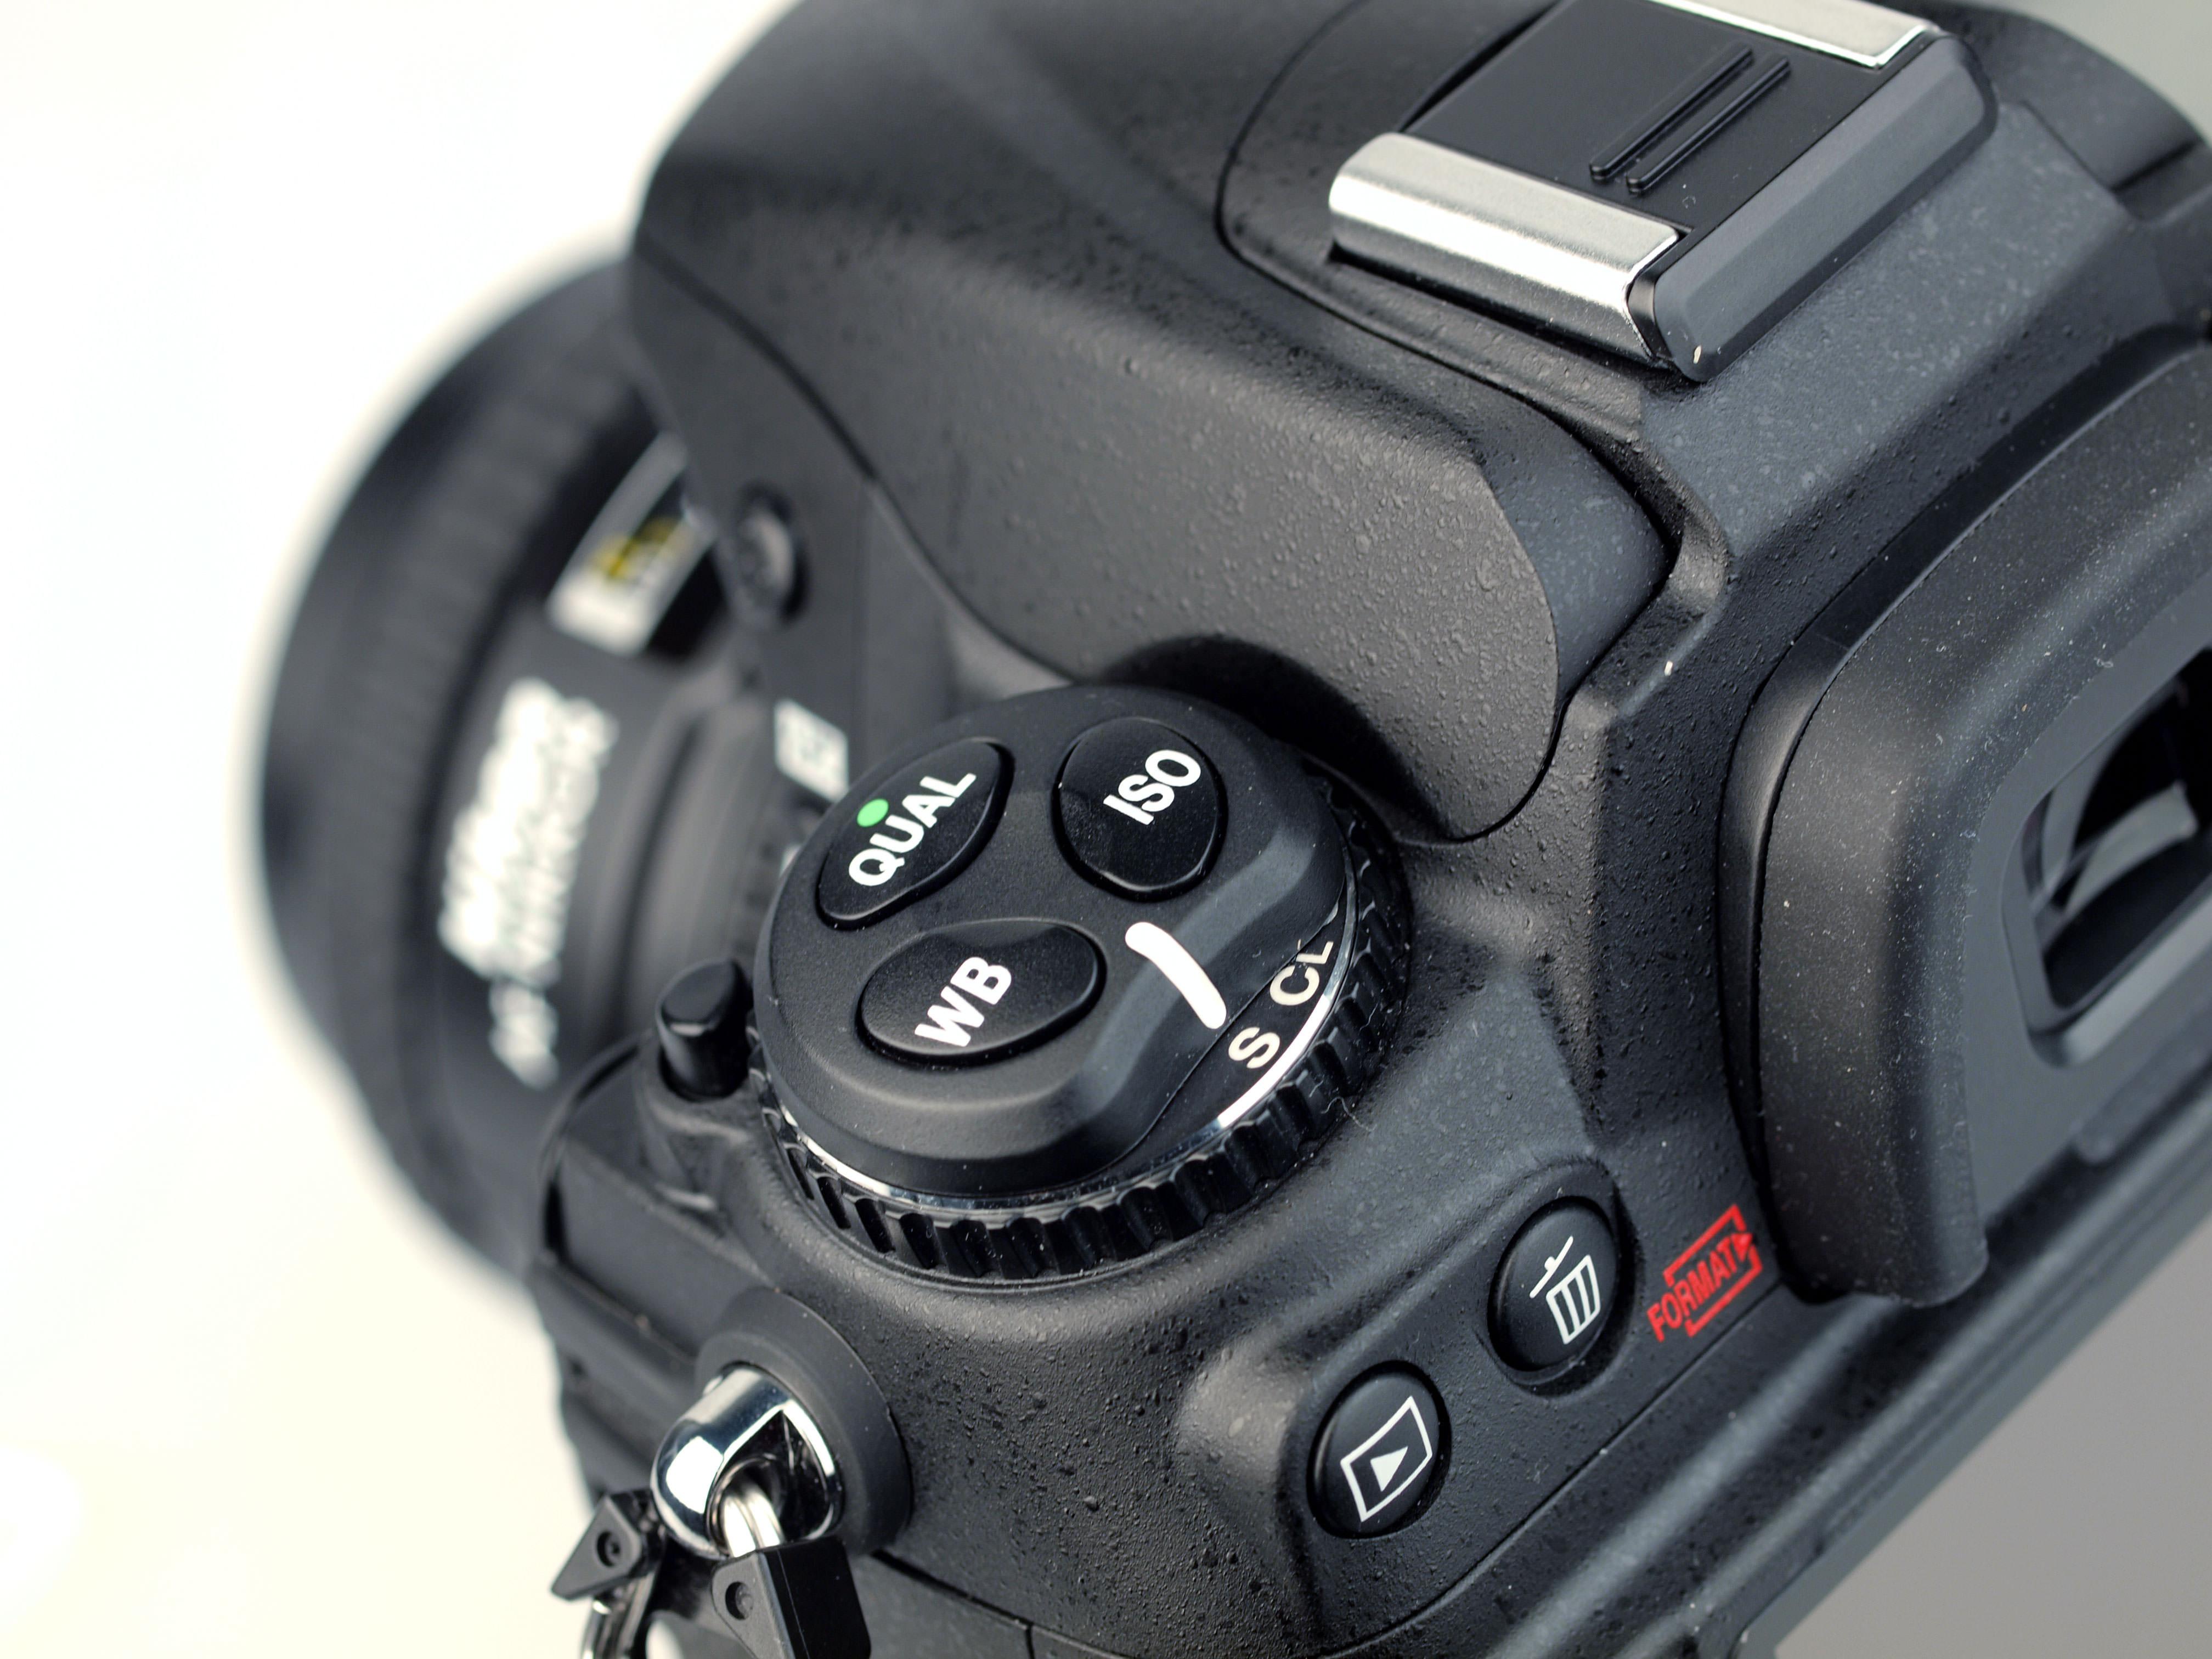 Nikon D300s Digital SLR Review